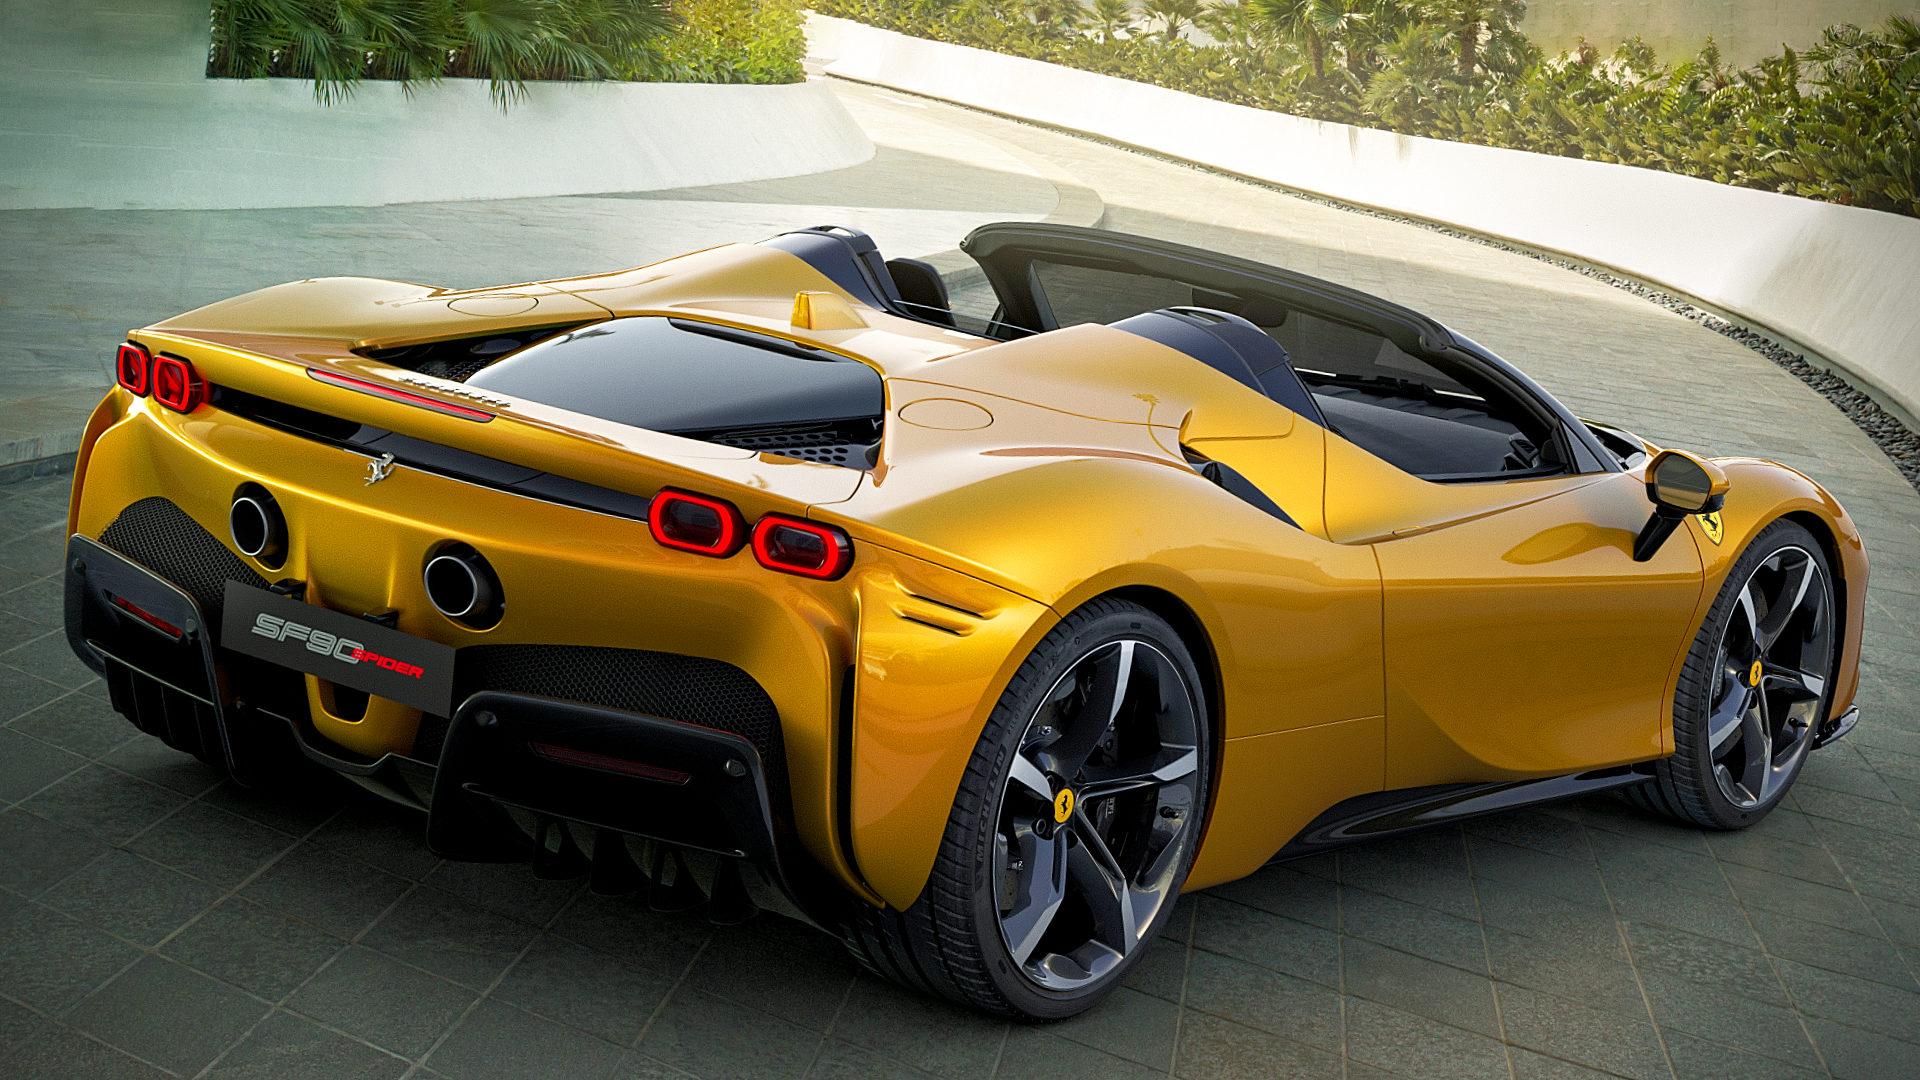 2021 Ferrari SF90 Spider Hybrid Pictures